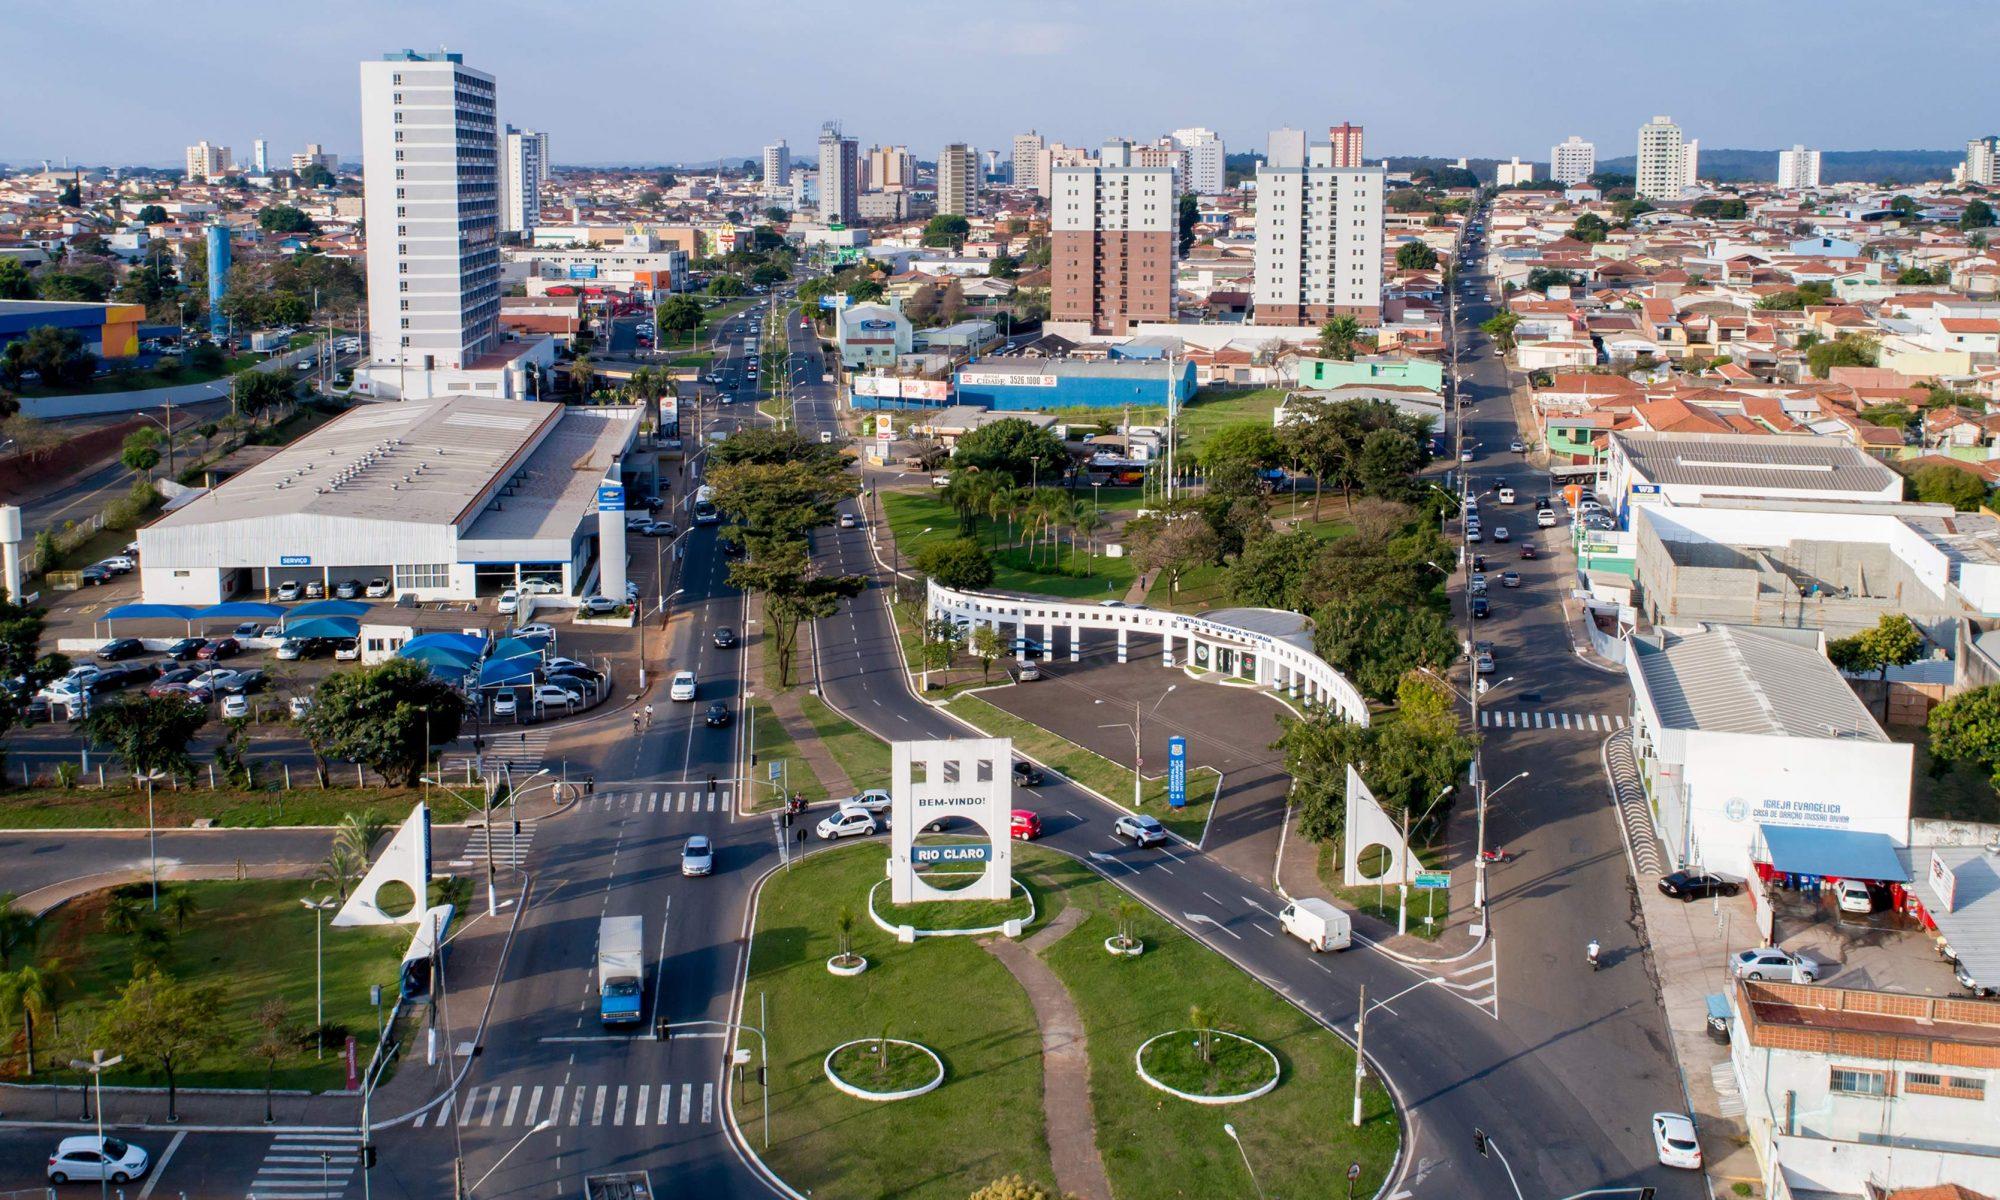 Prefeitura de Rio Claro - SP